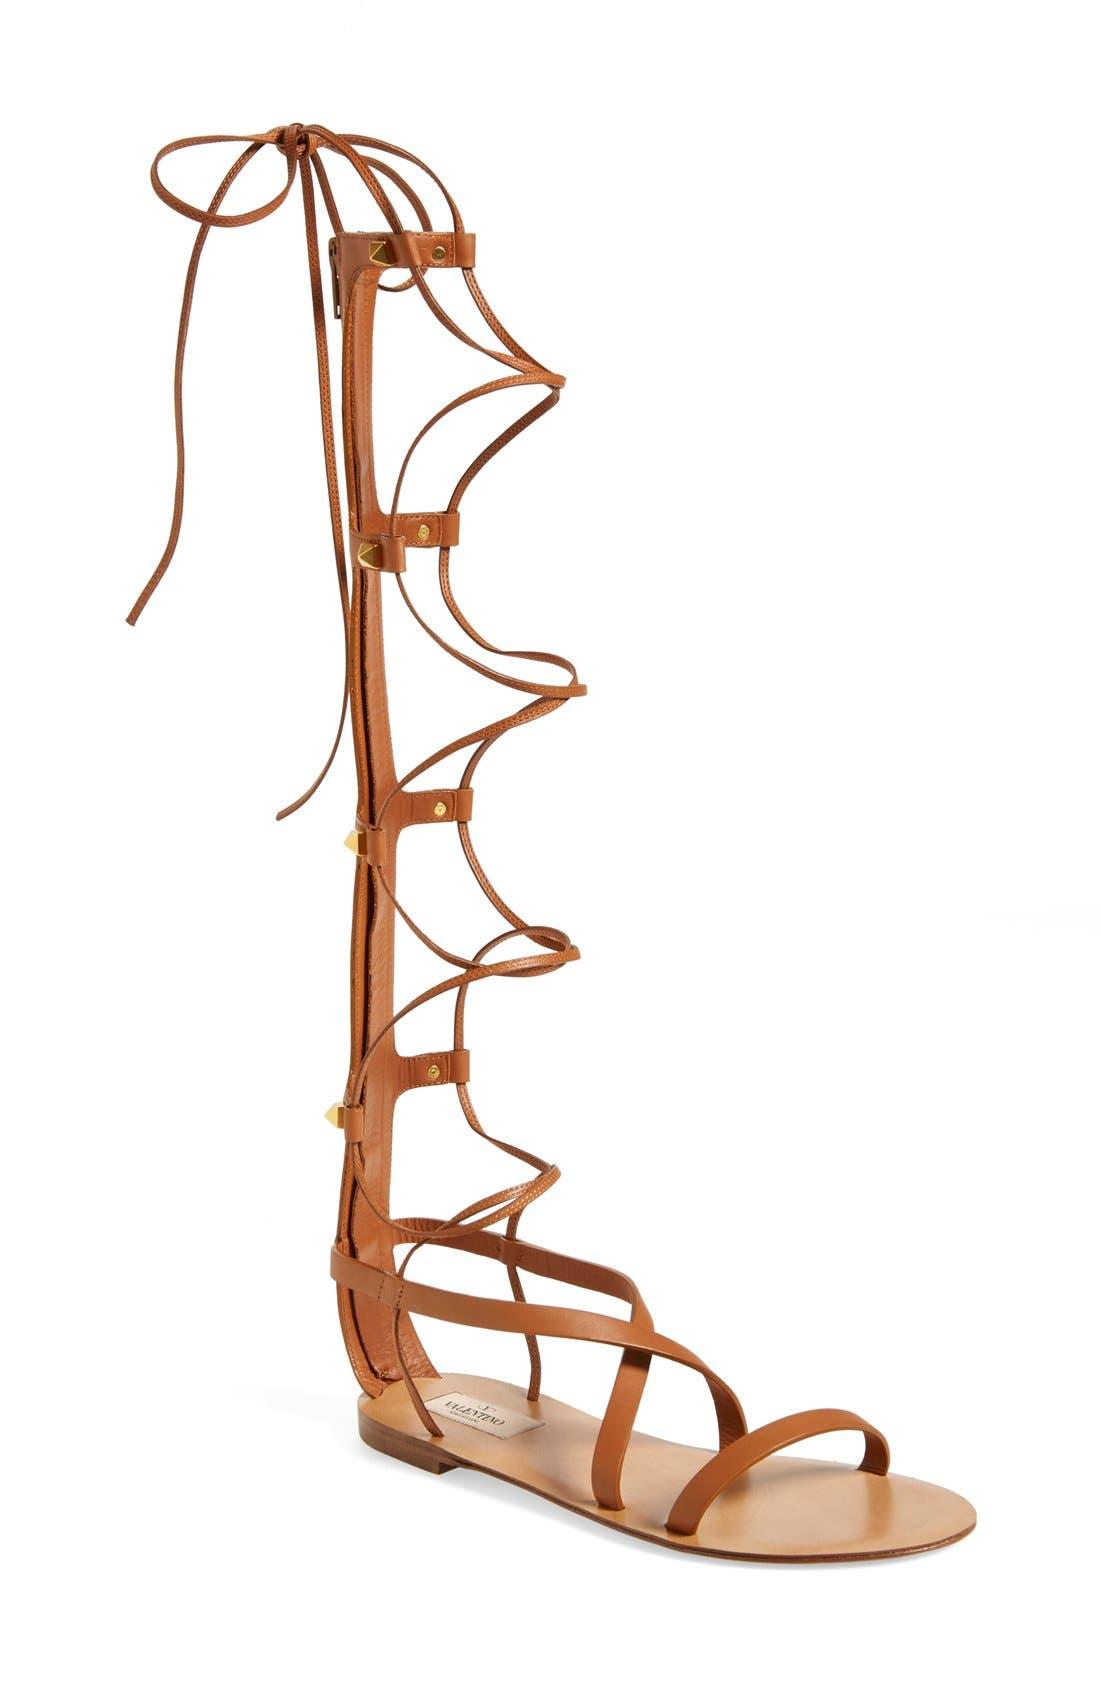 VALENTINO GARAVANI 'Rockstud' Tall Gladiator Sandal, Main, color, 200